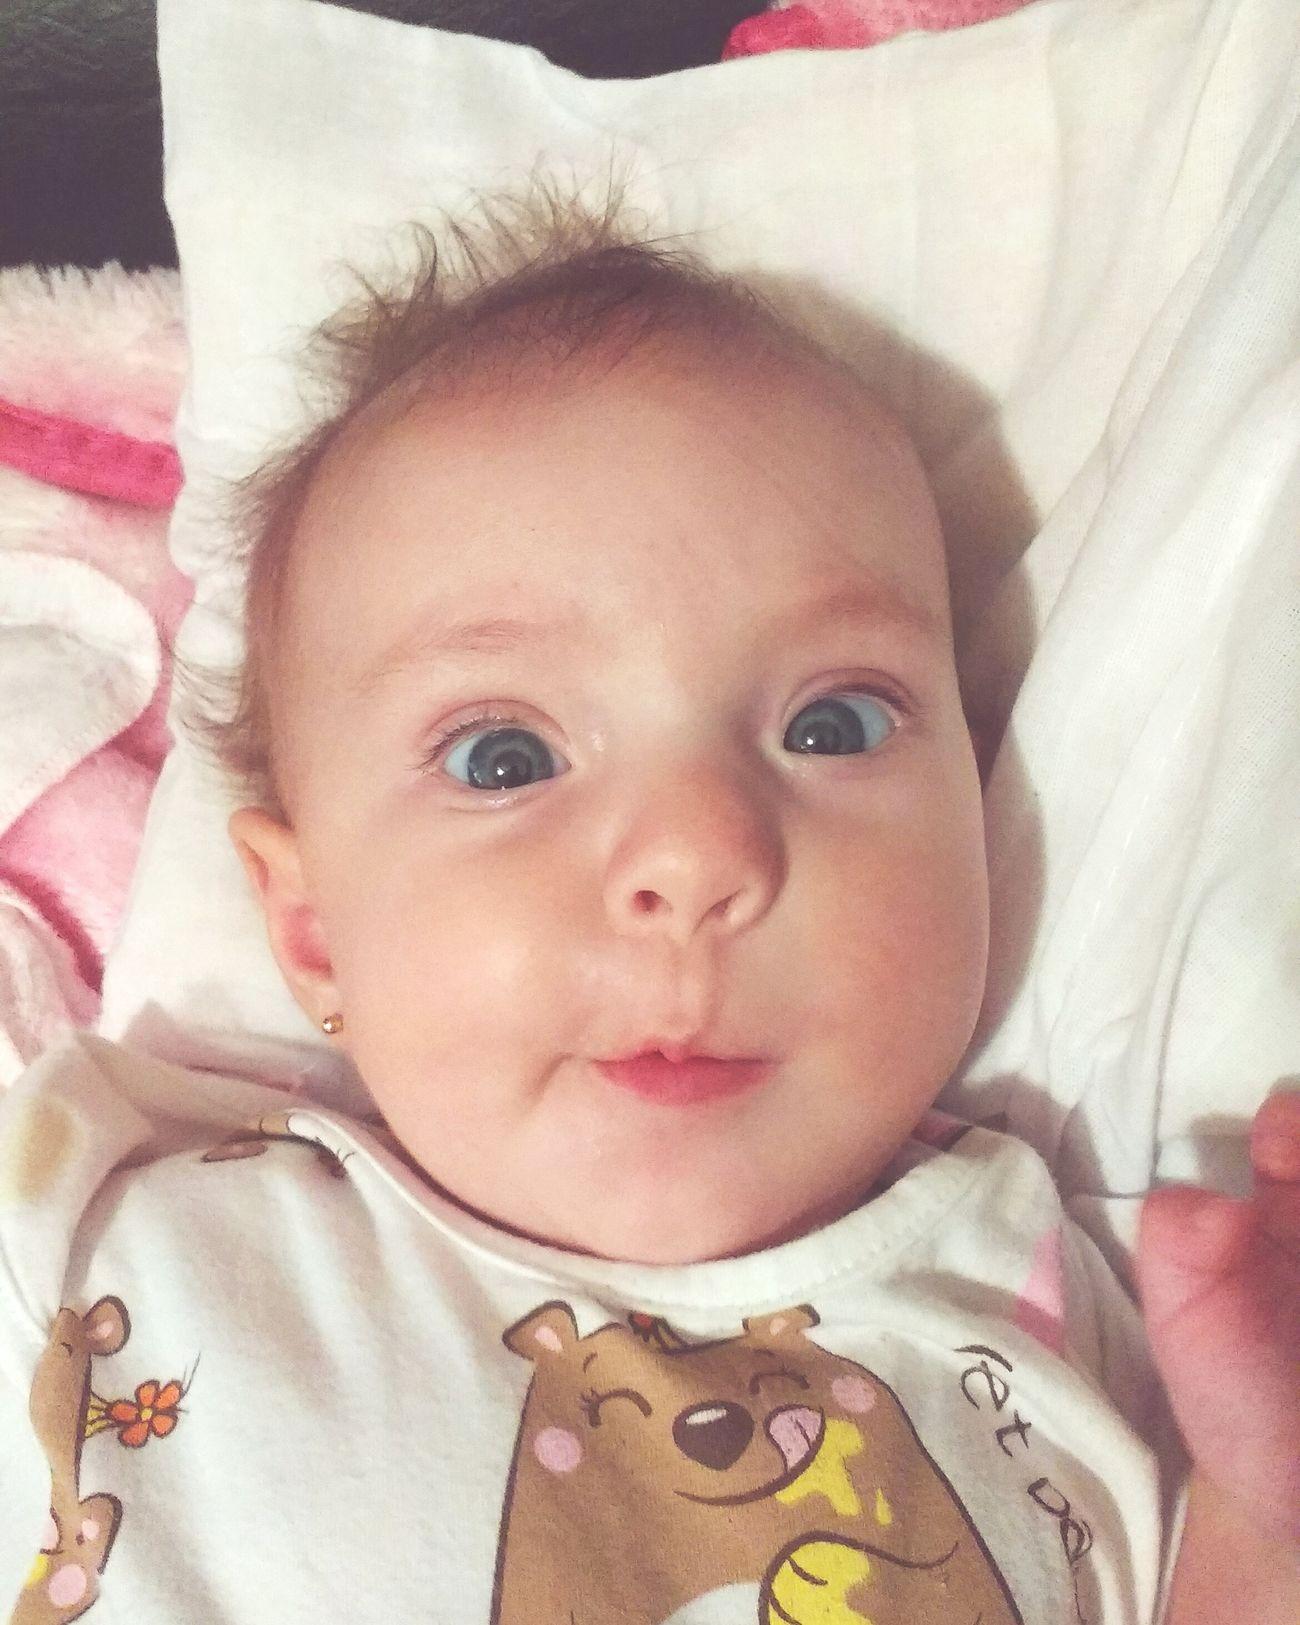 Minha irmã é a bebe mais linda ❤ Baby Baby Clothing Cute Popular Photo Sao Paulo - Brazil First Eyeem Photo Baby ❤ Babygirl ♥ Babycat Babylove Baby Beautiful Girl Love